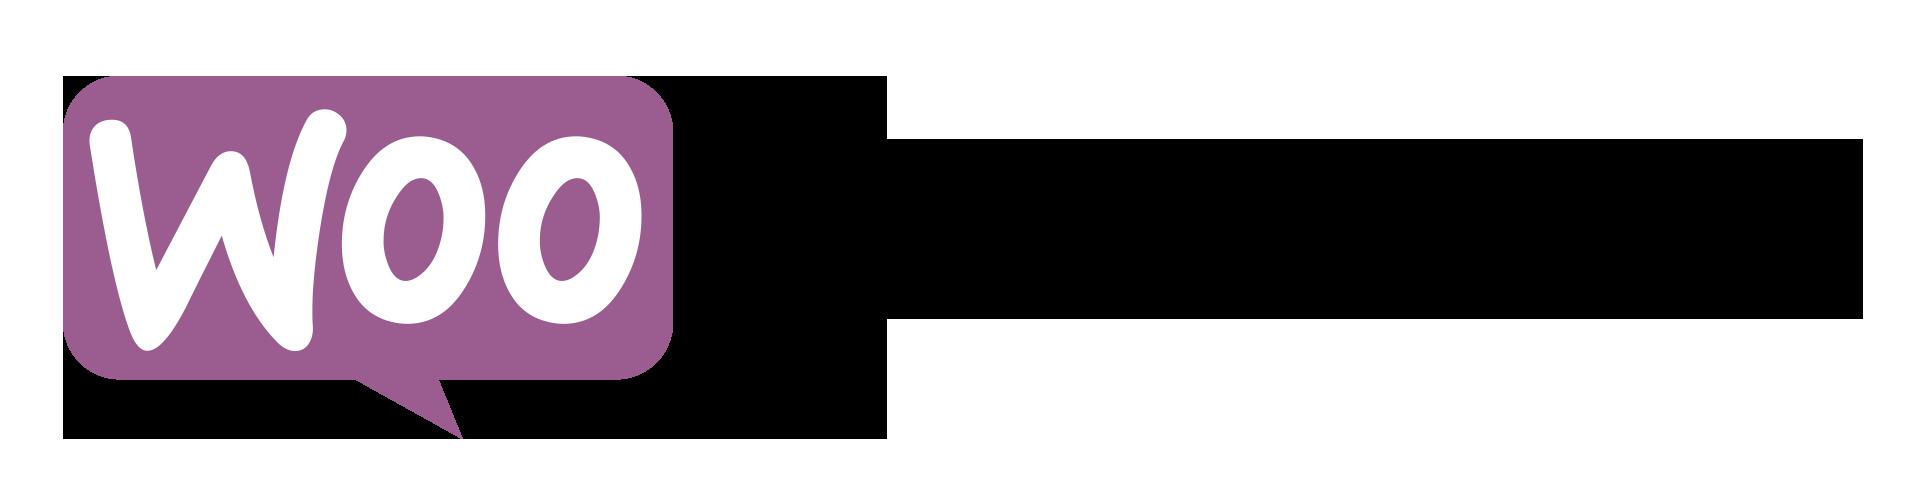 woocommerce-logo-e1429552613105